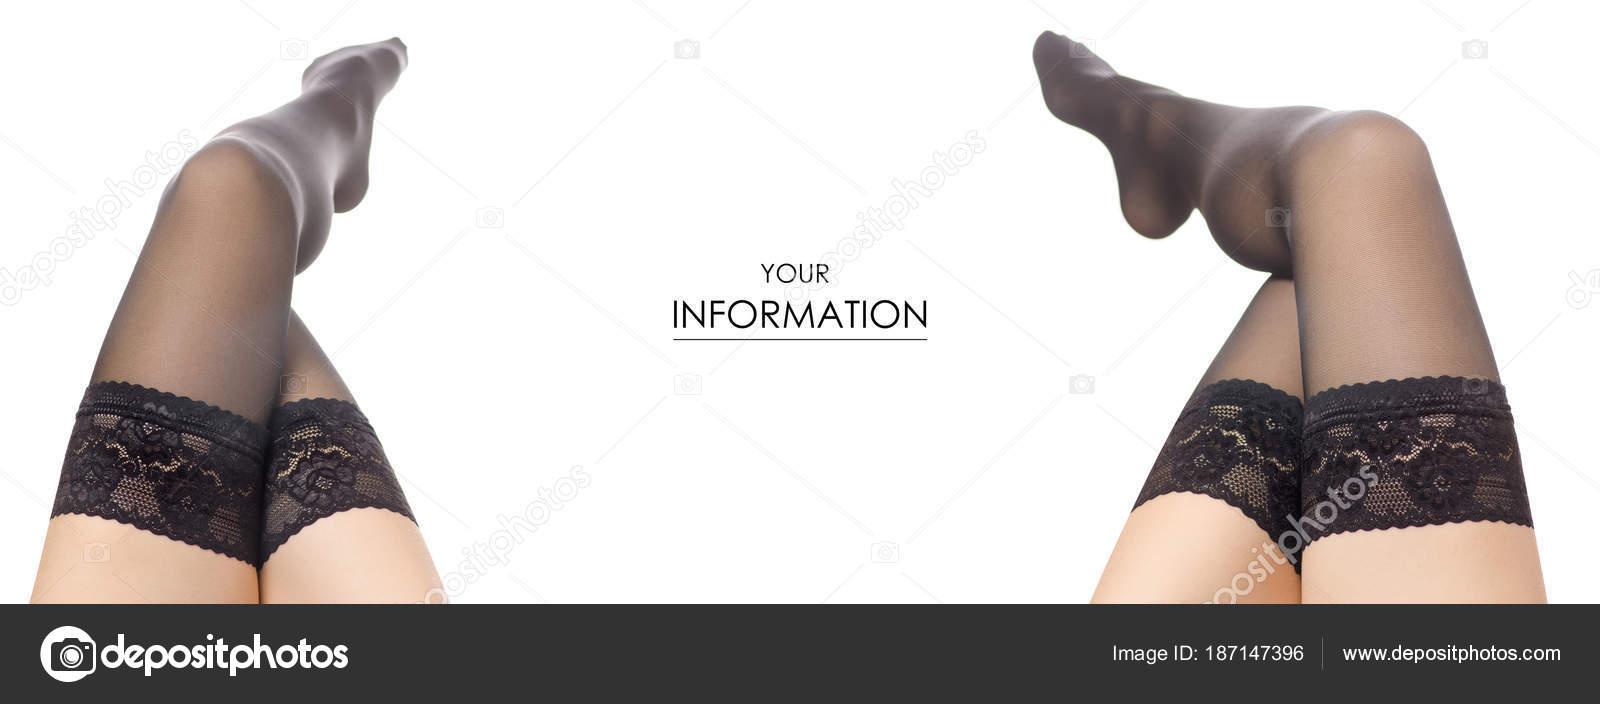 b9f1e696610 Female legs black nylon stockings fashion beauty buy sale shop set pattern  on a white background isolation — Photo by ...